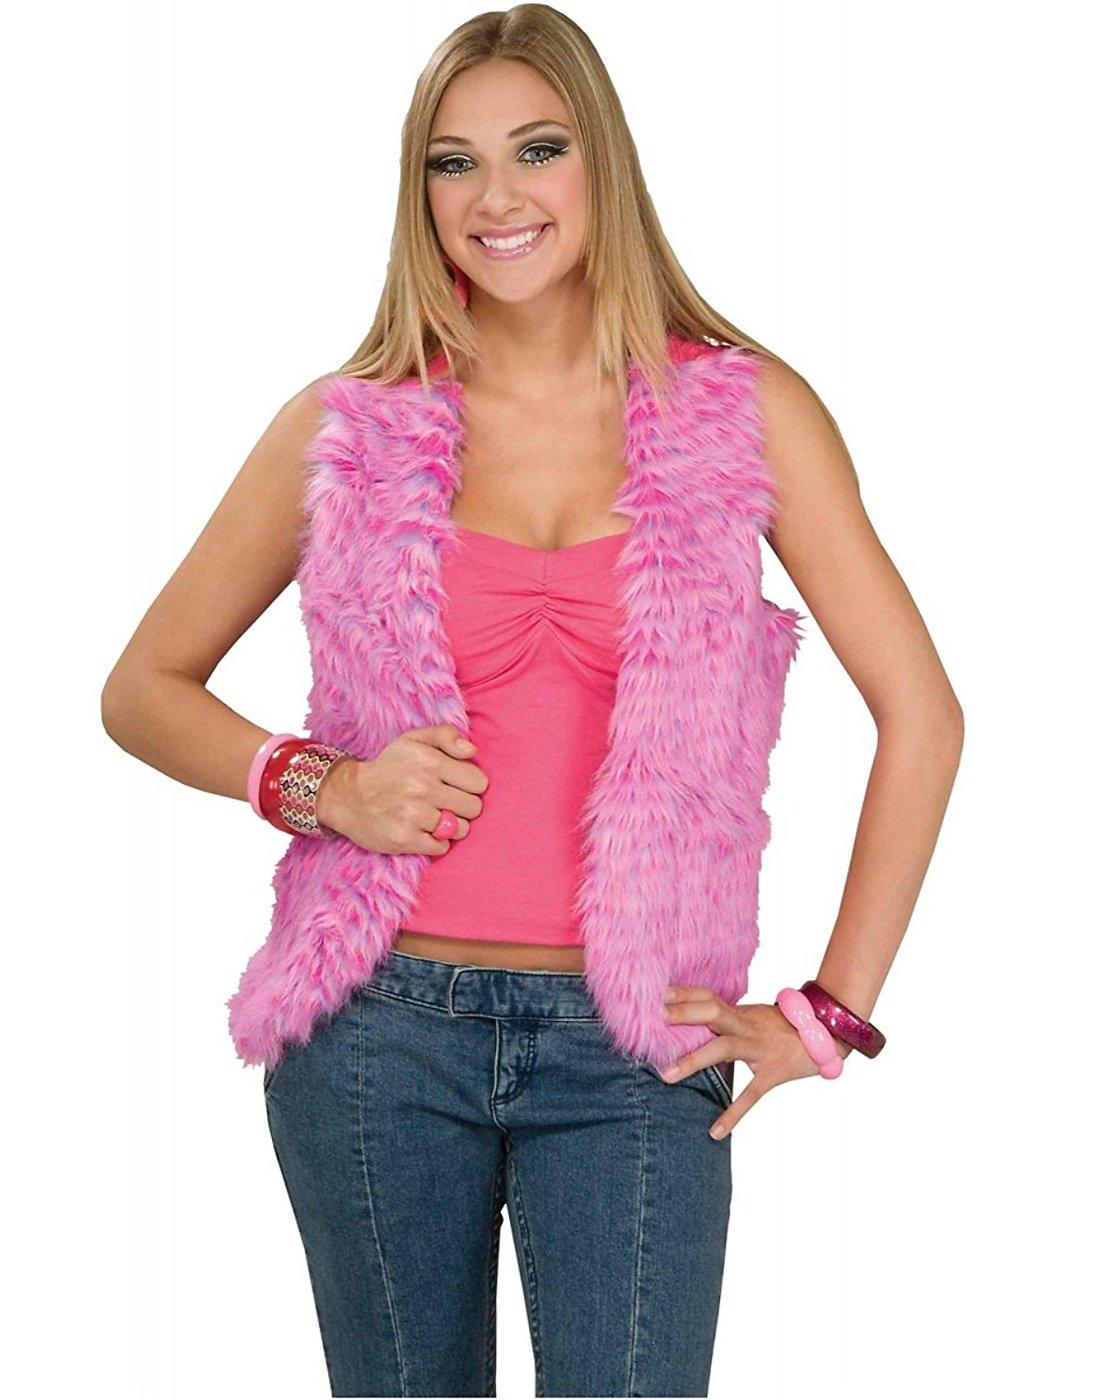 Forum Novelties Women's 60's Mod Revolution Groovy Pink Vest Costume Accessory, Multi, Standard by Forum Novelties